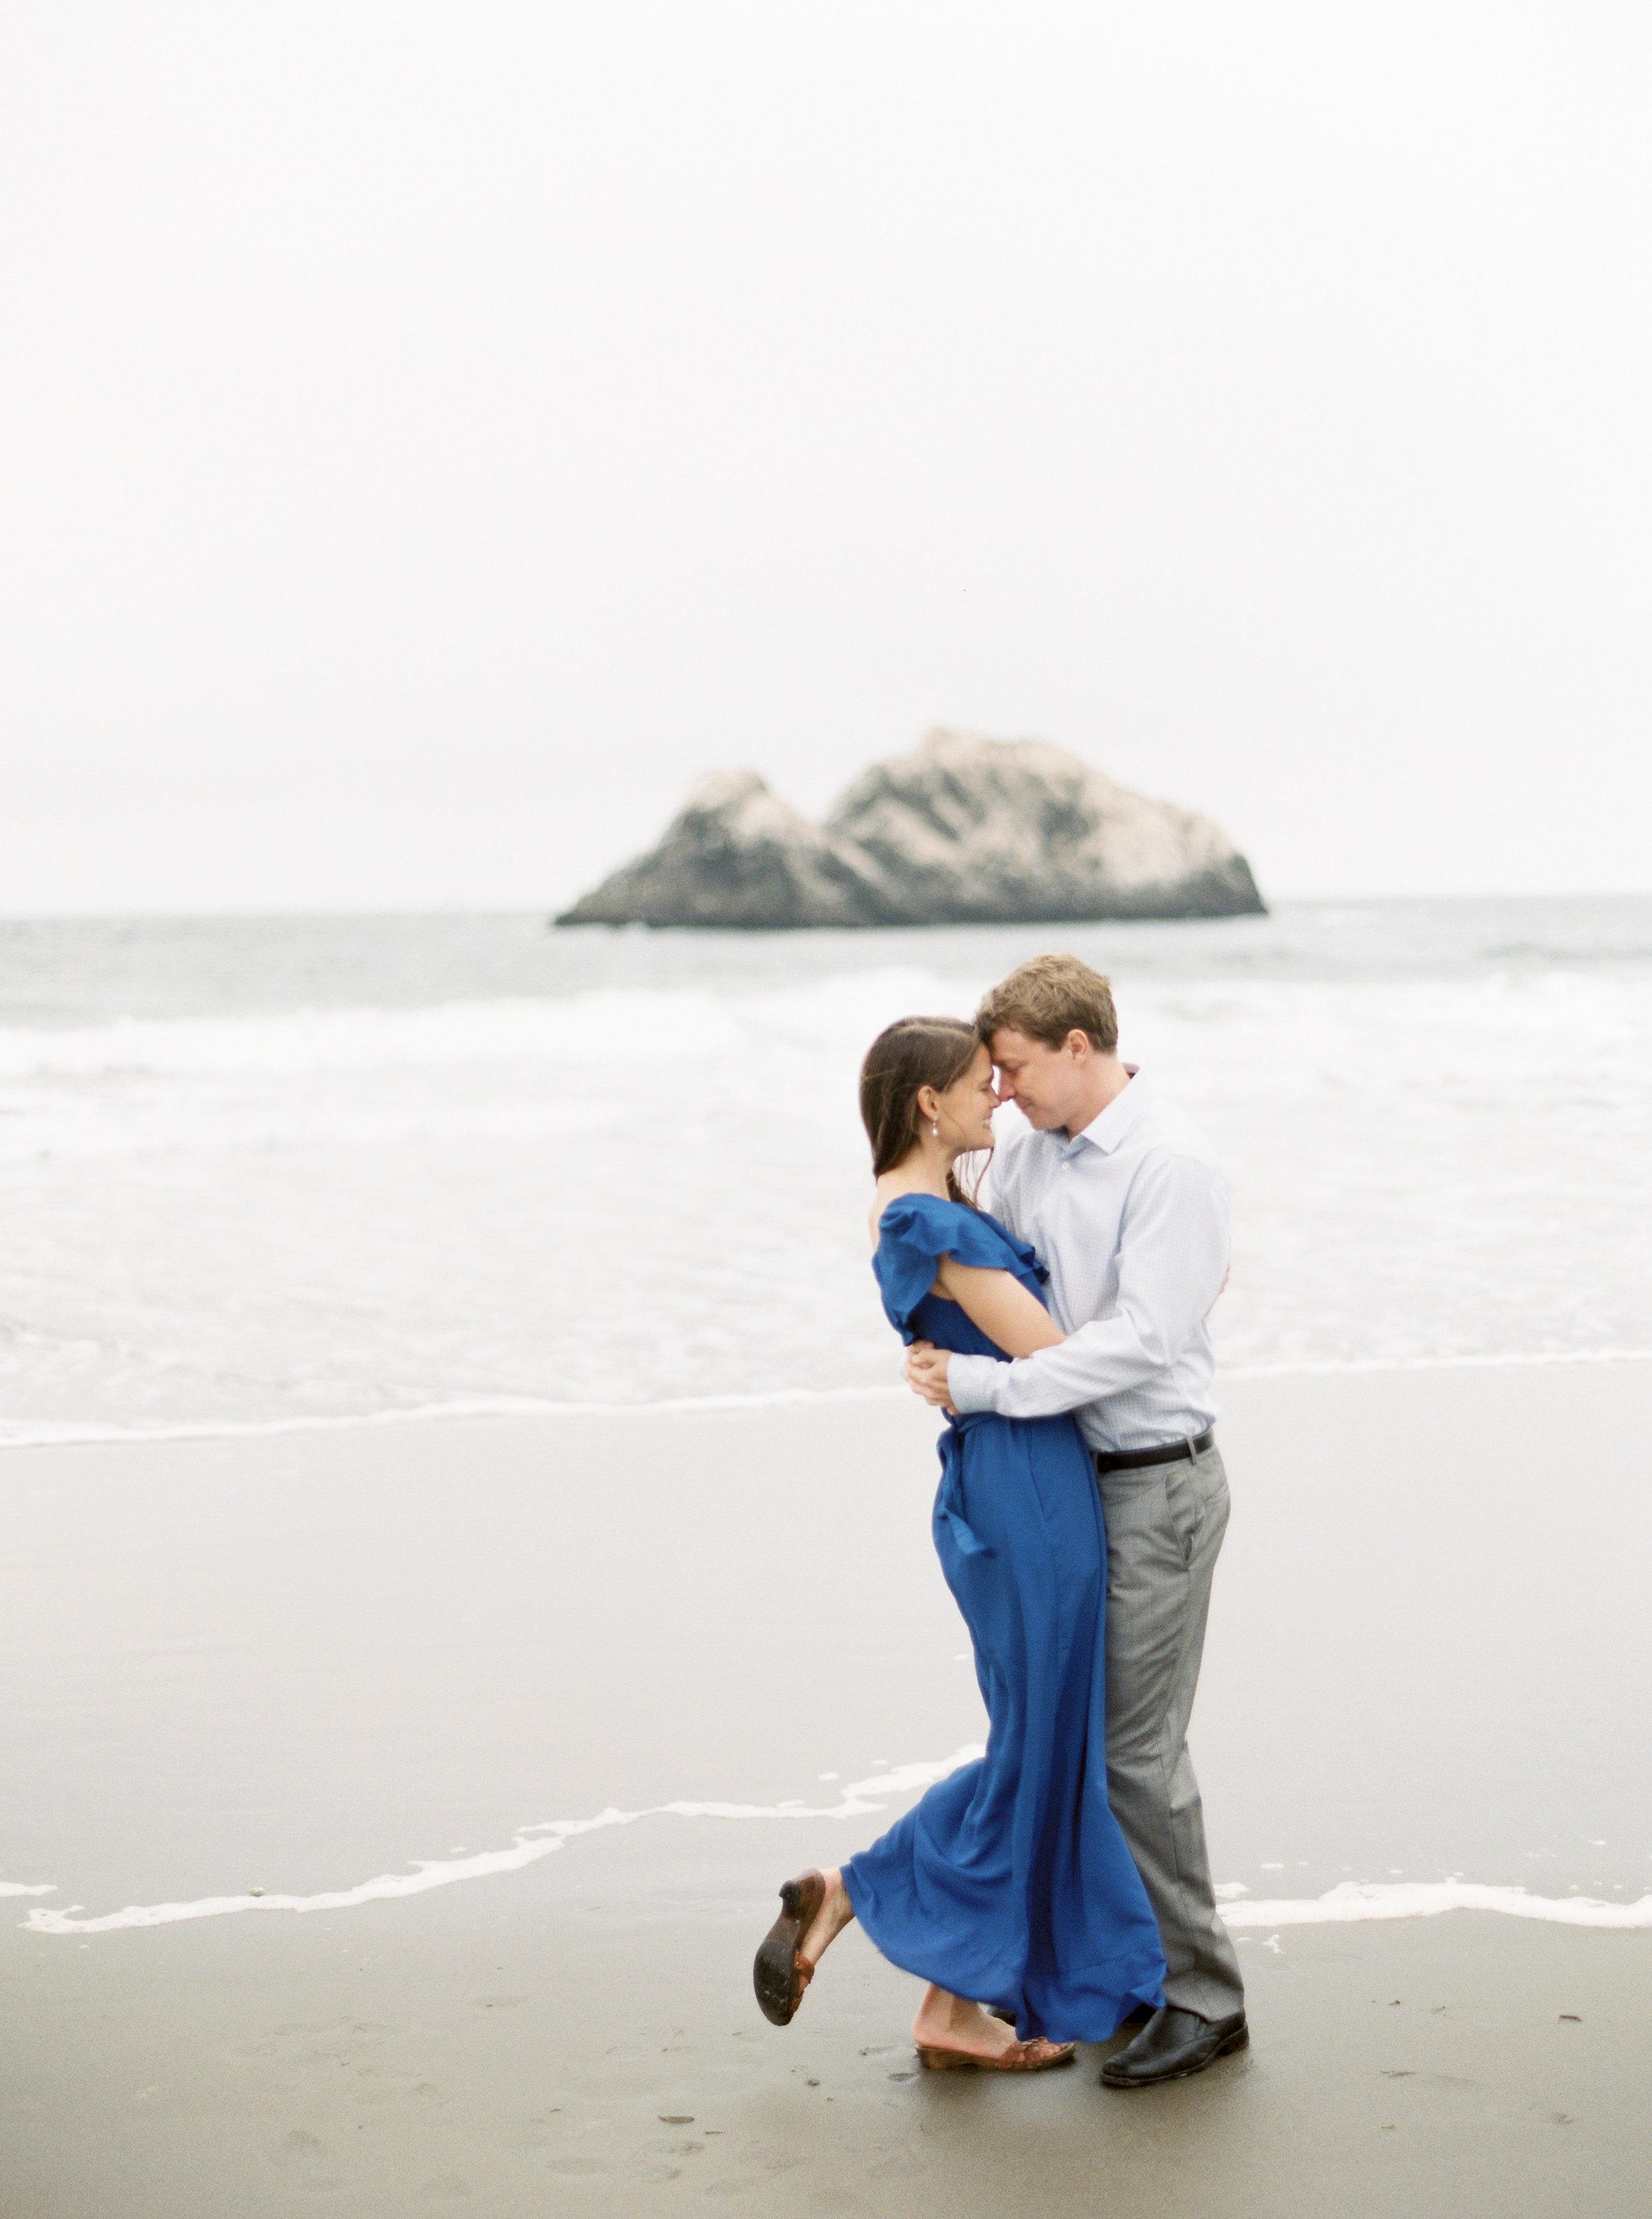 sutro-baths-san-francisco-california-engagement-25.jpg